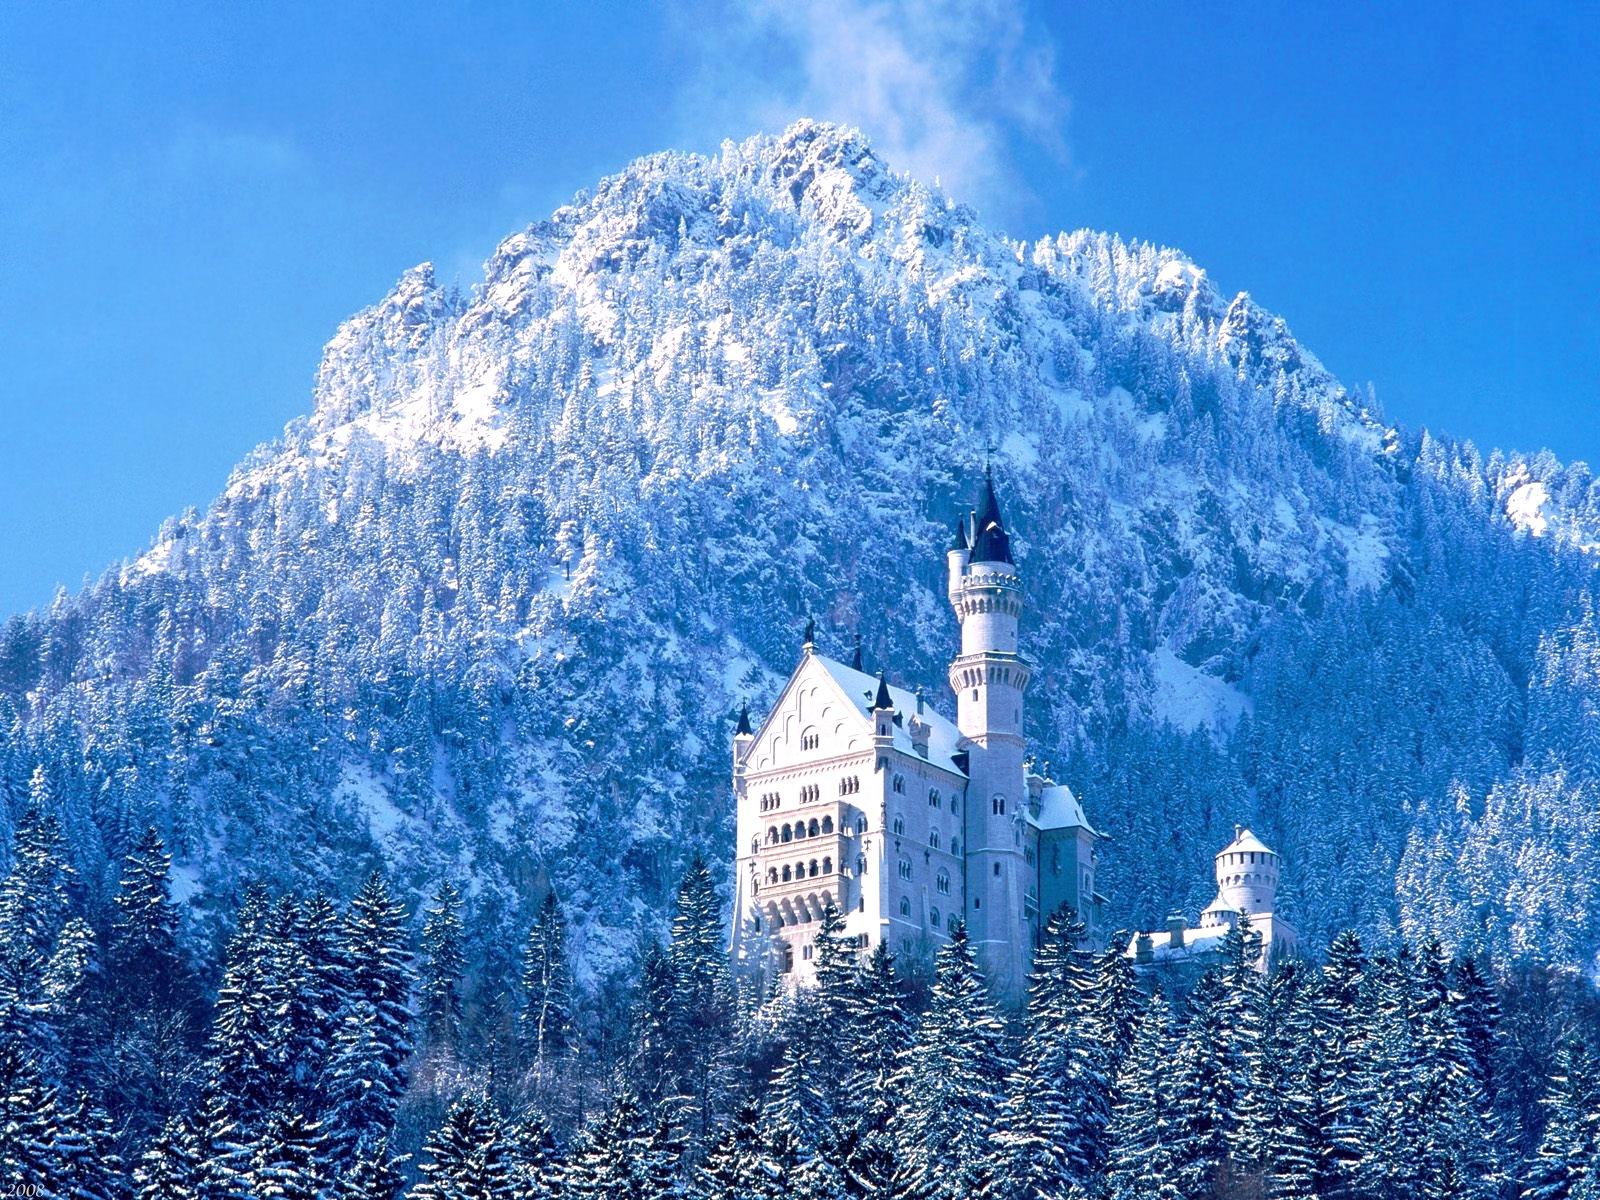 Beautiful Winter Scenery Wallpapers Group 68